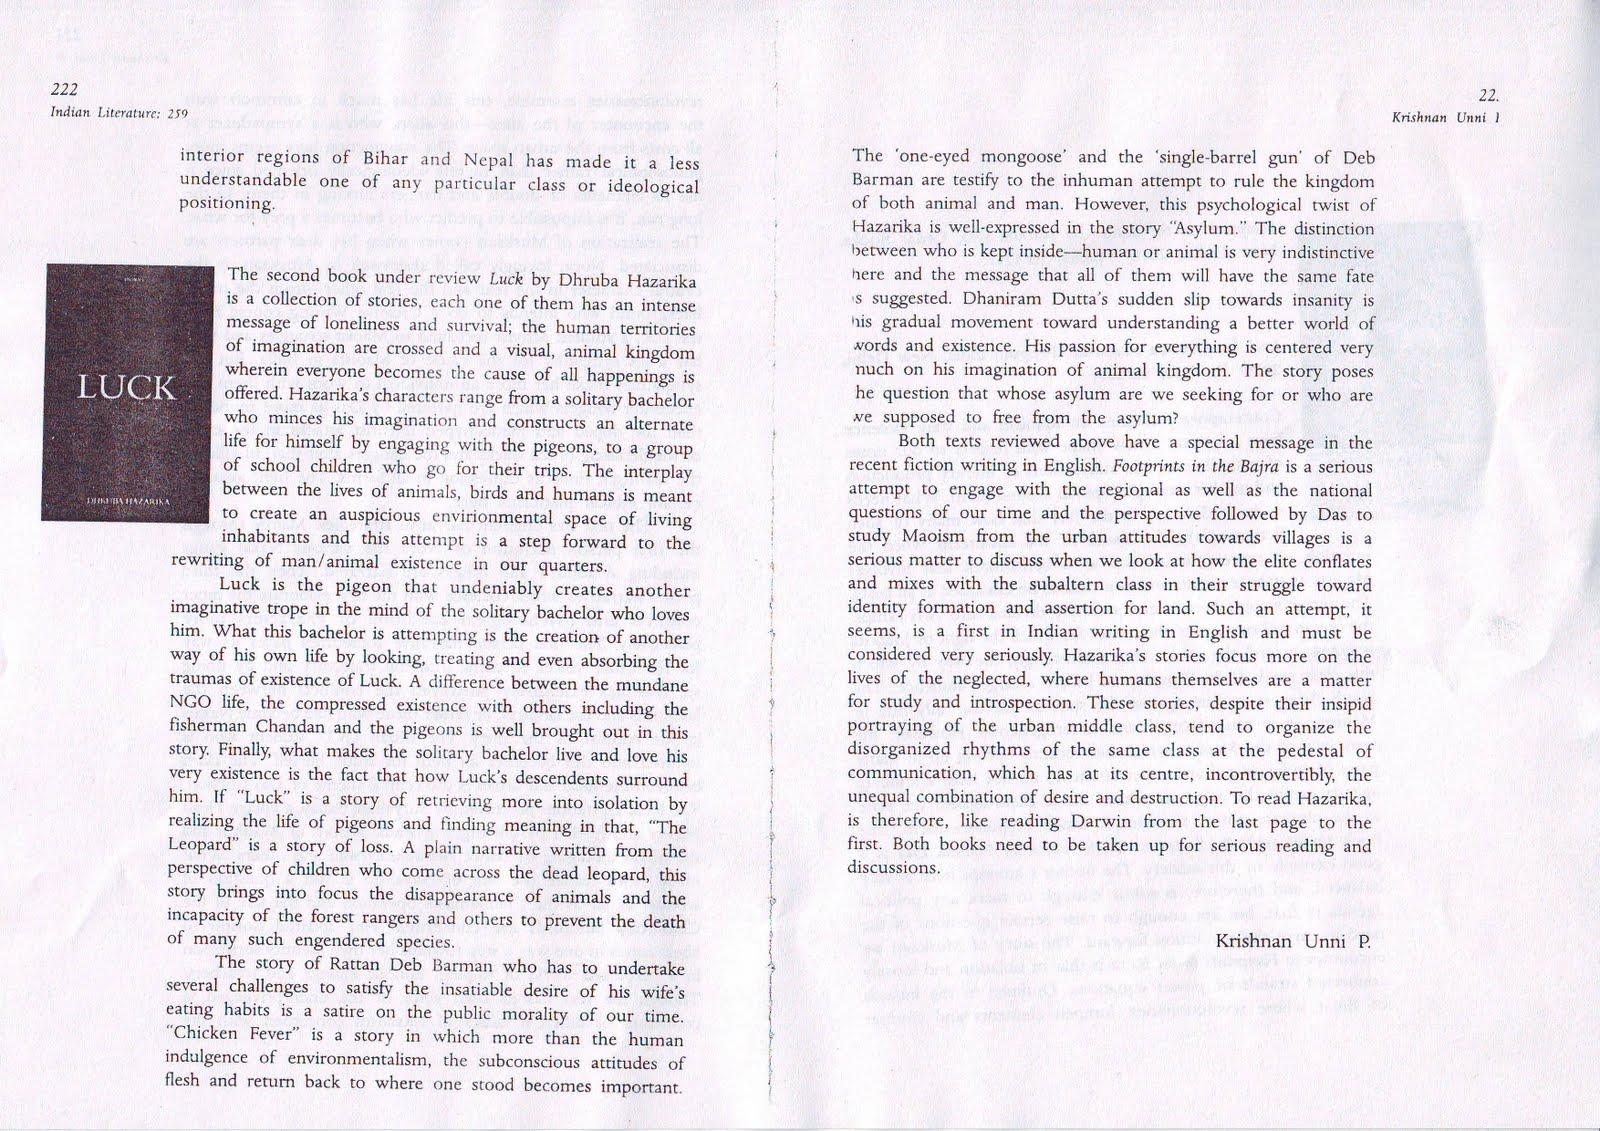 Free essay on democracy in india